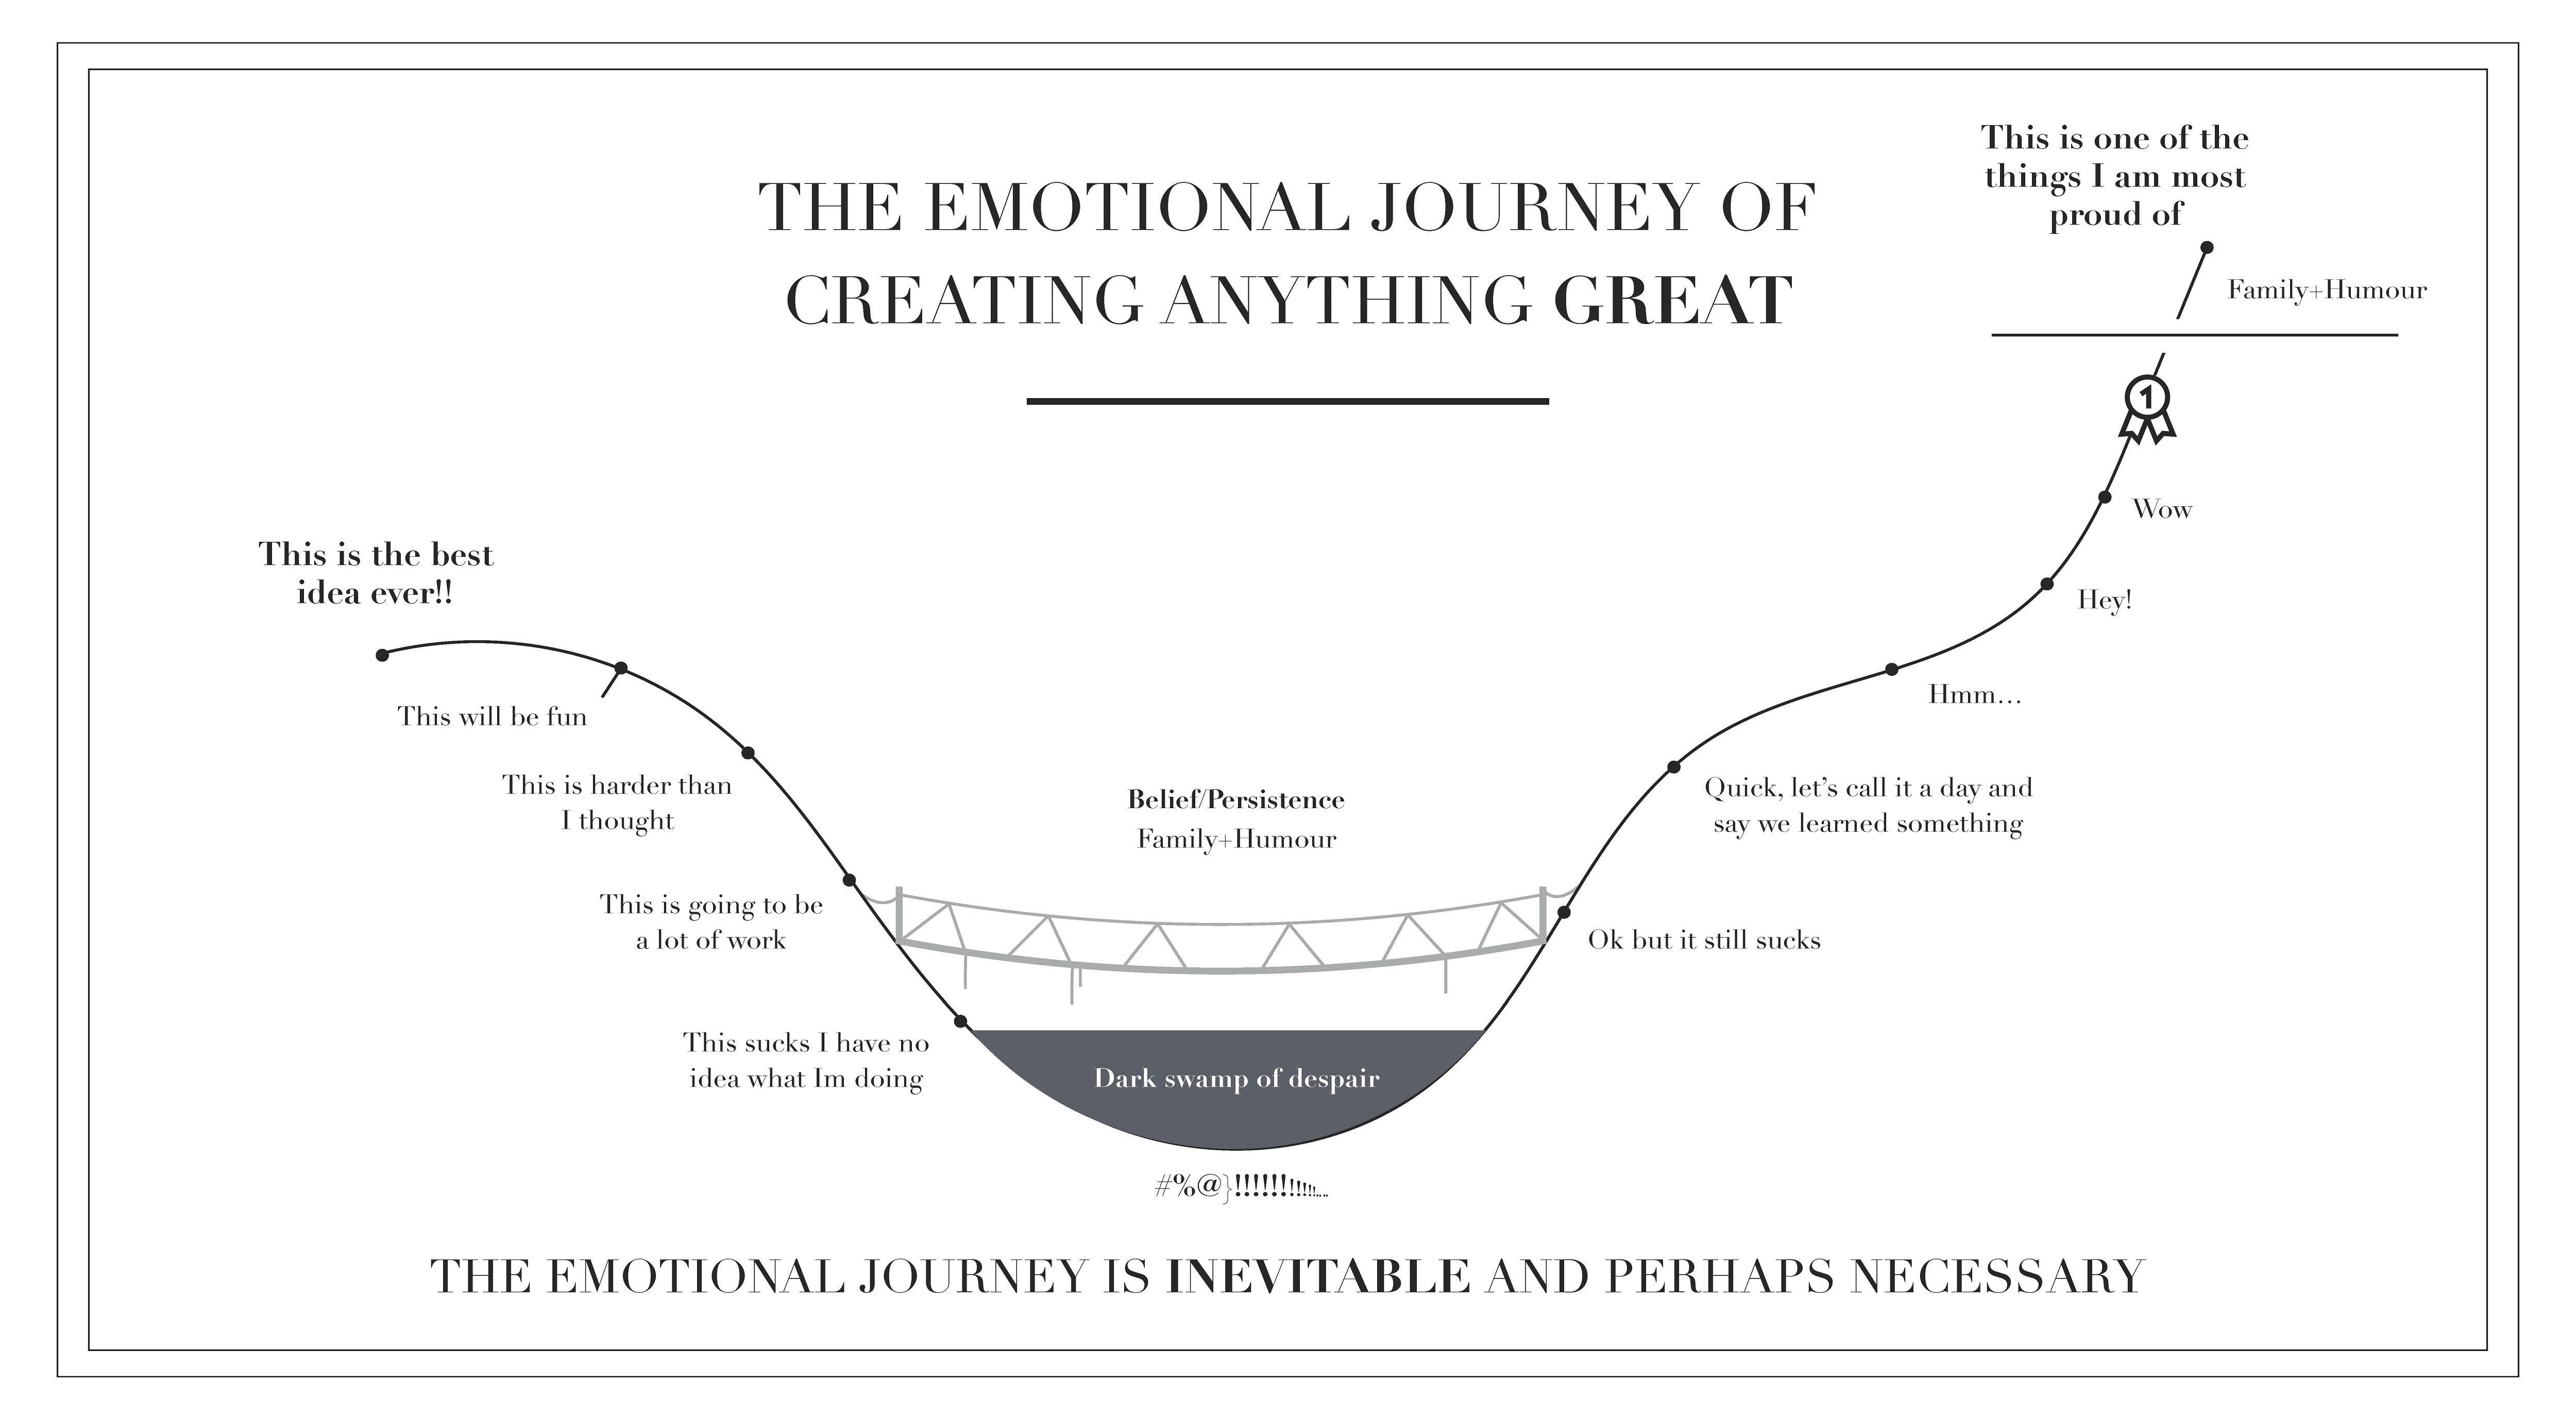 Emmotional journey